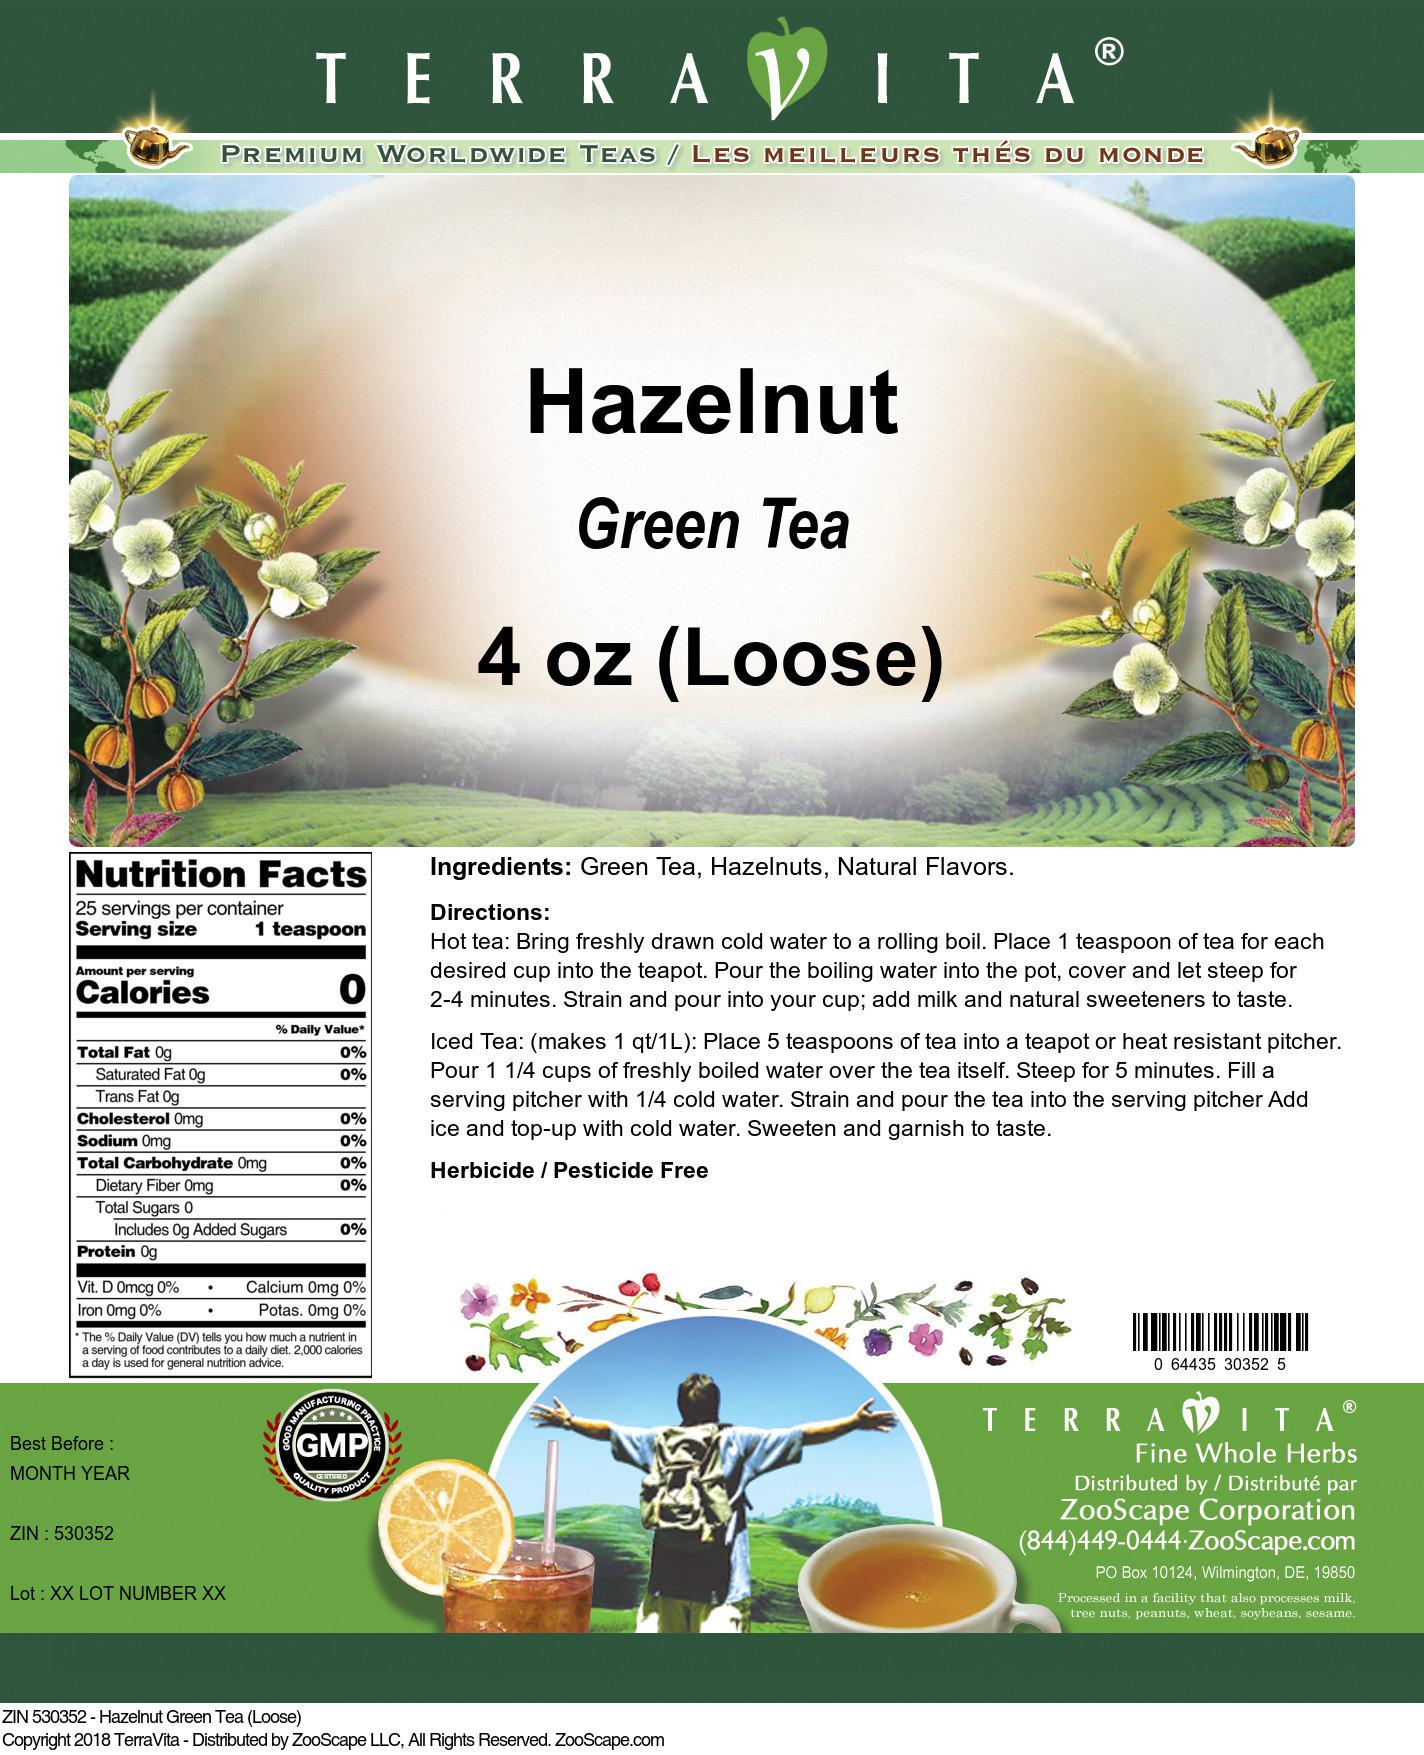 Hazelnut Green Tea (Loose)